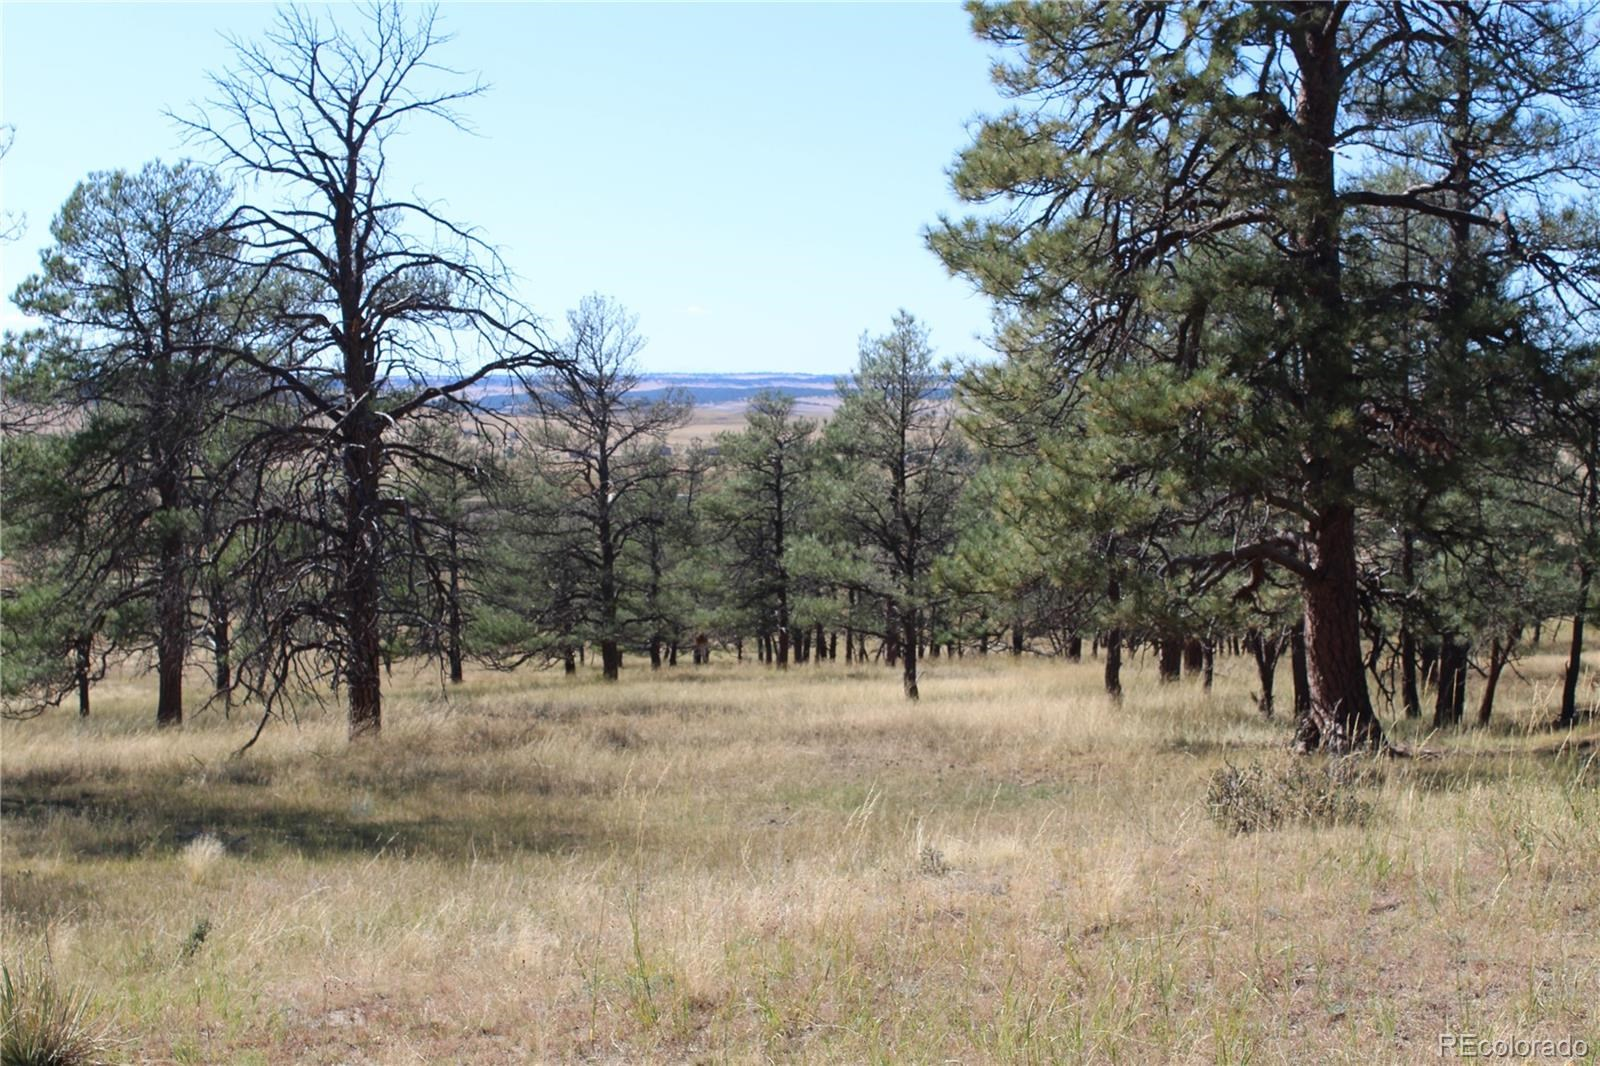 MLS# 2877174 - 4 - Cattle Circle, Kiowa, CO 80117